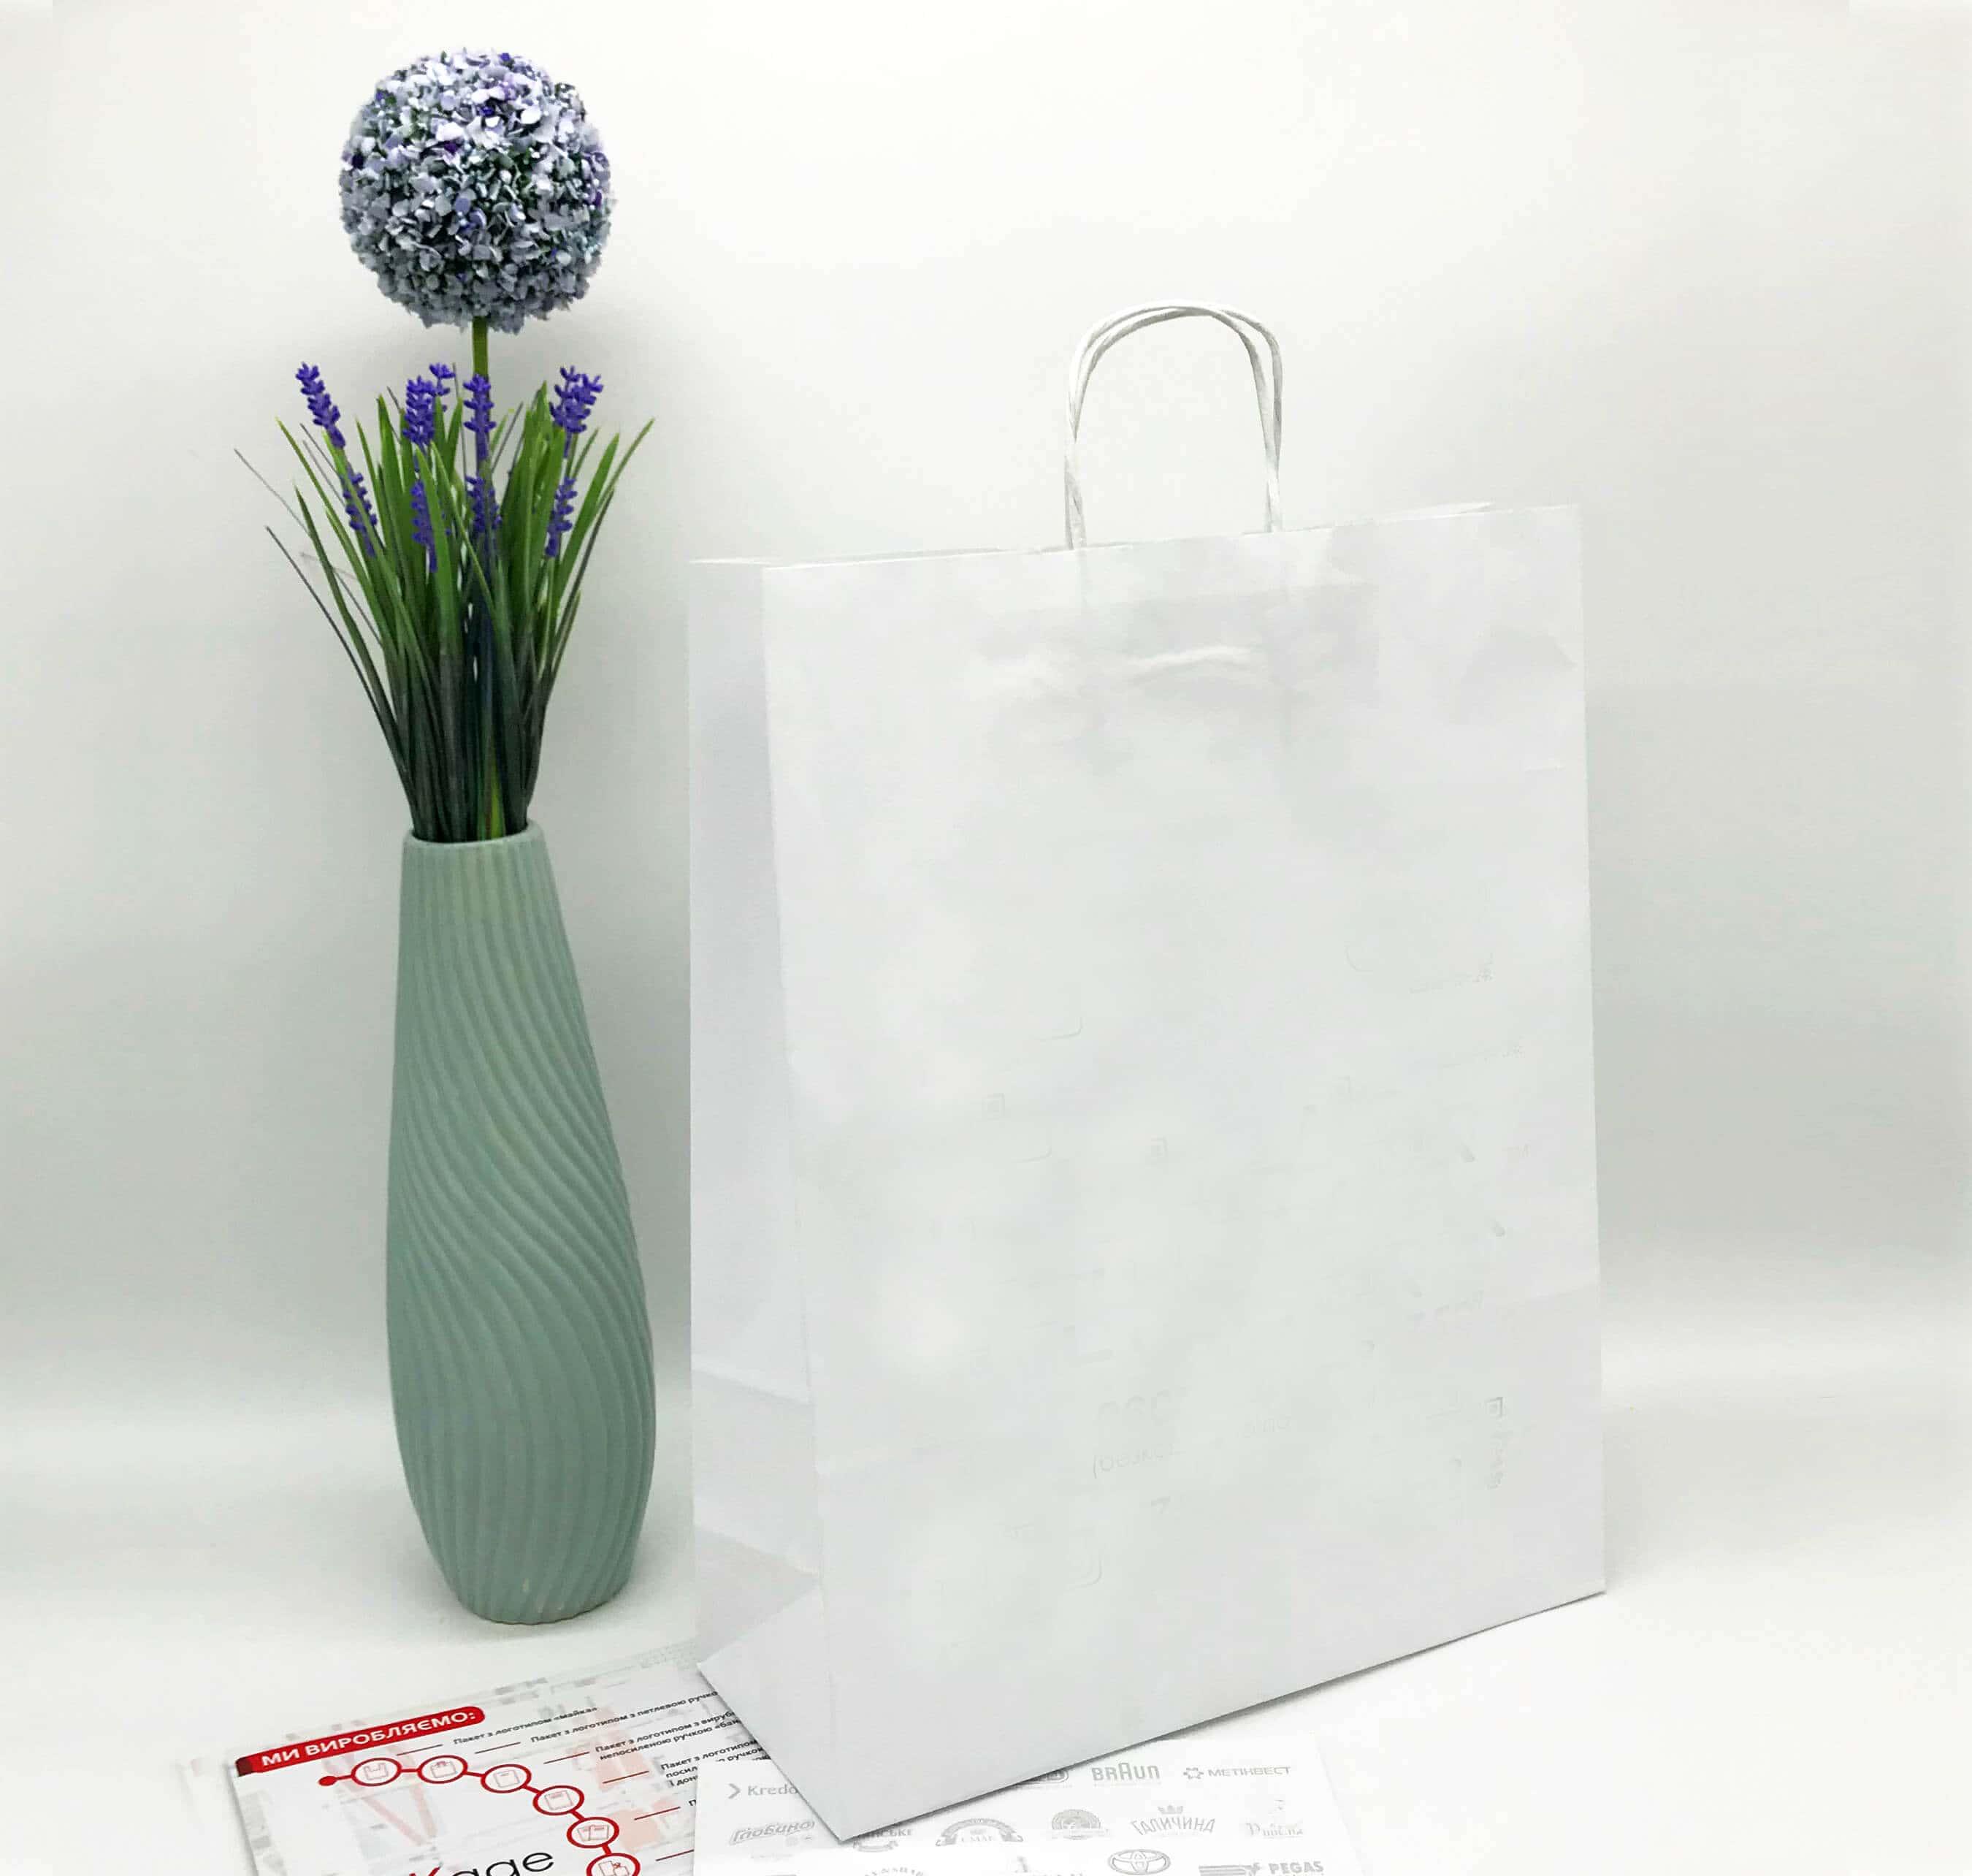 Белый крафт пакет без печати 320*400, 90 г/см -Chernigov Package - Фото Белый сред_бп